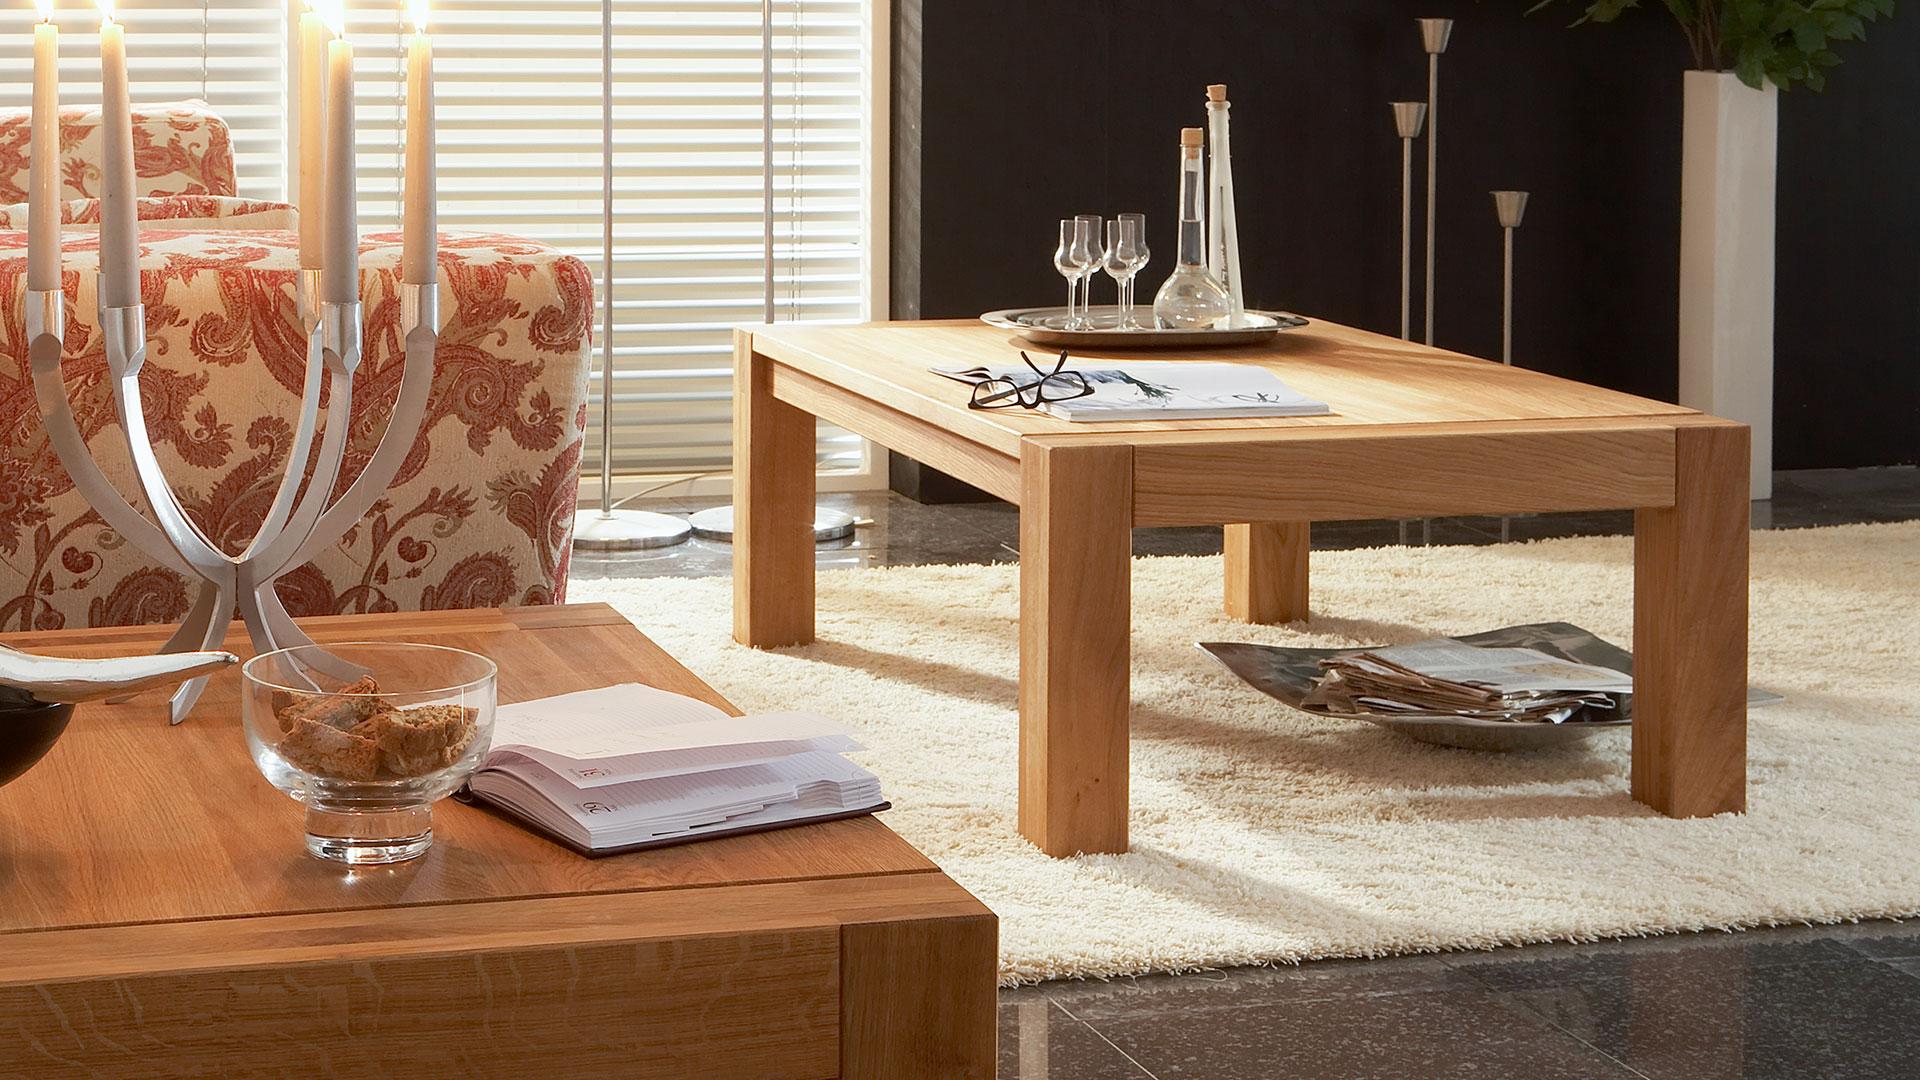 couchtisch mensula. Black Bedroom Furniture Sets. Home Design Ideas